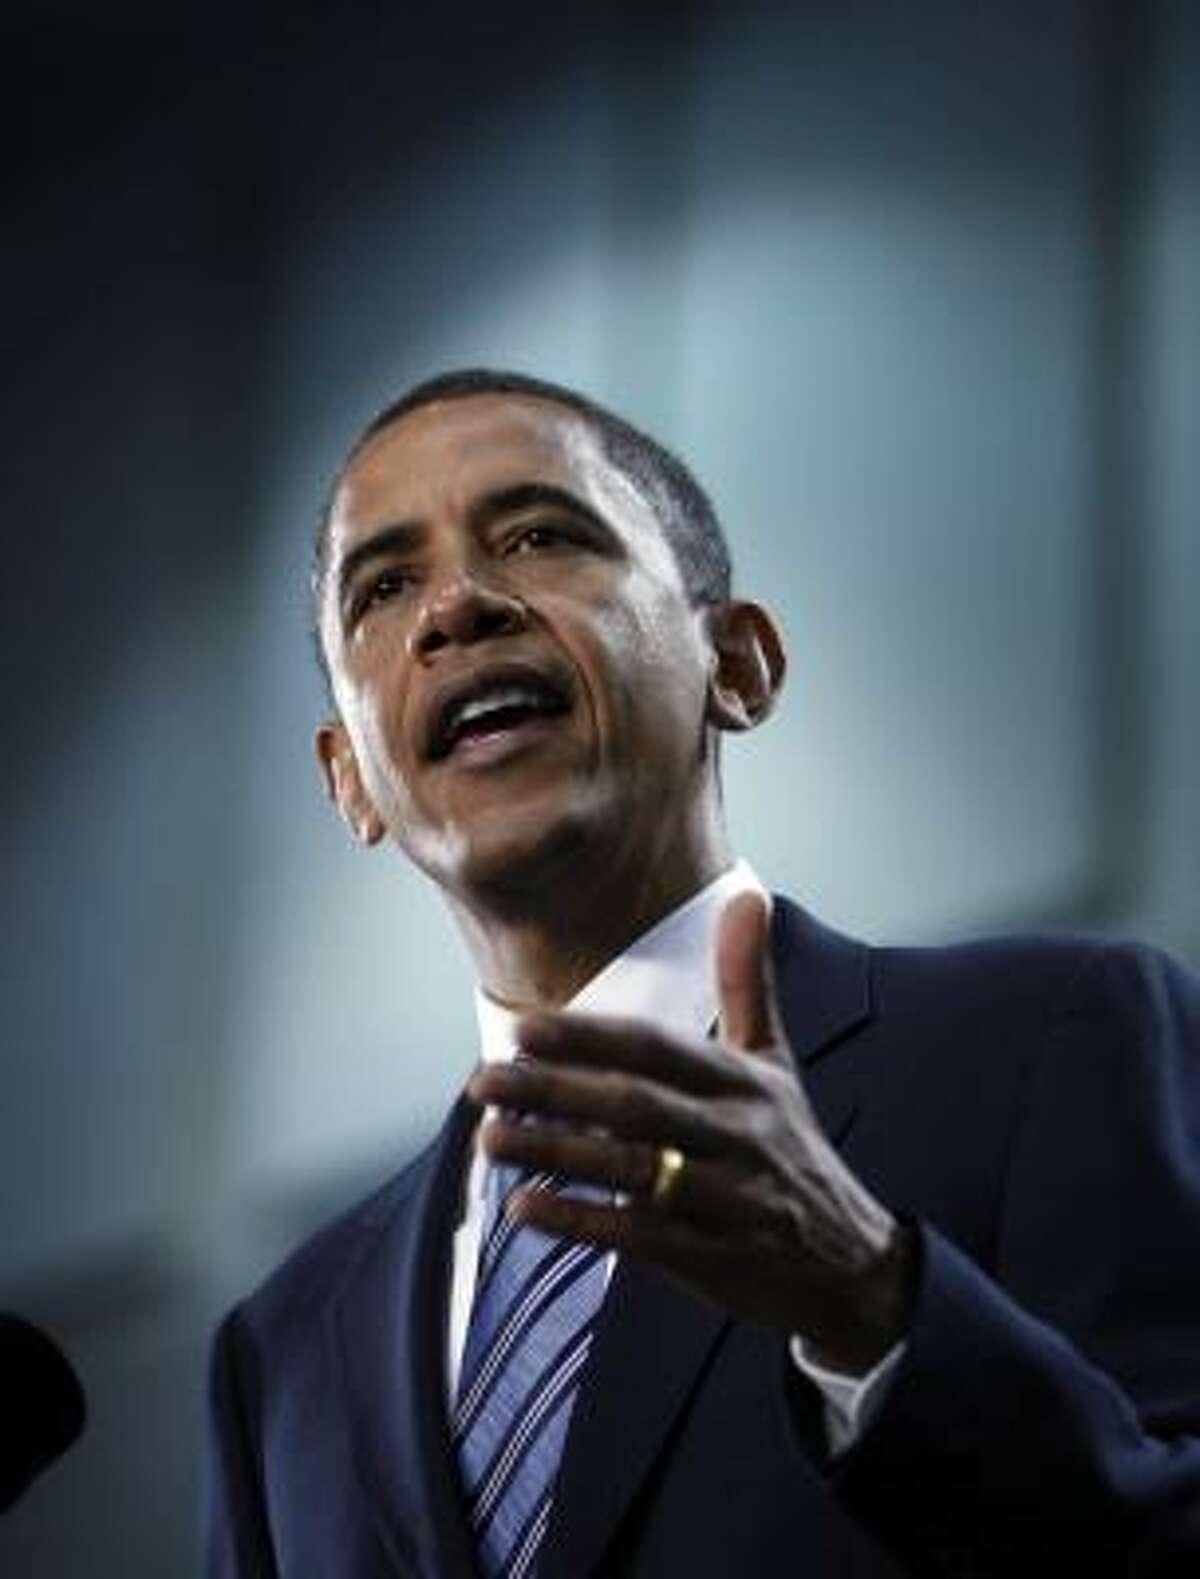 The Chronicle endorses Sen. Barack Obama, D-Ill., for president of the United States.